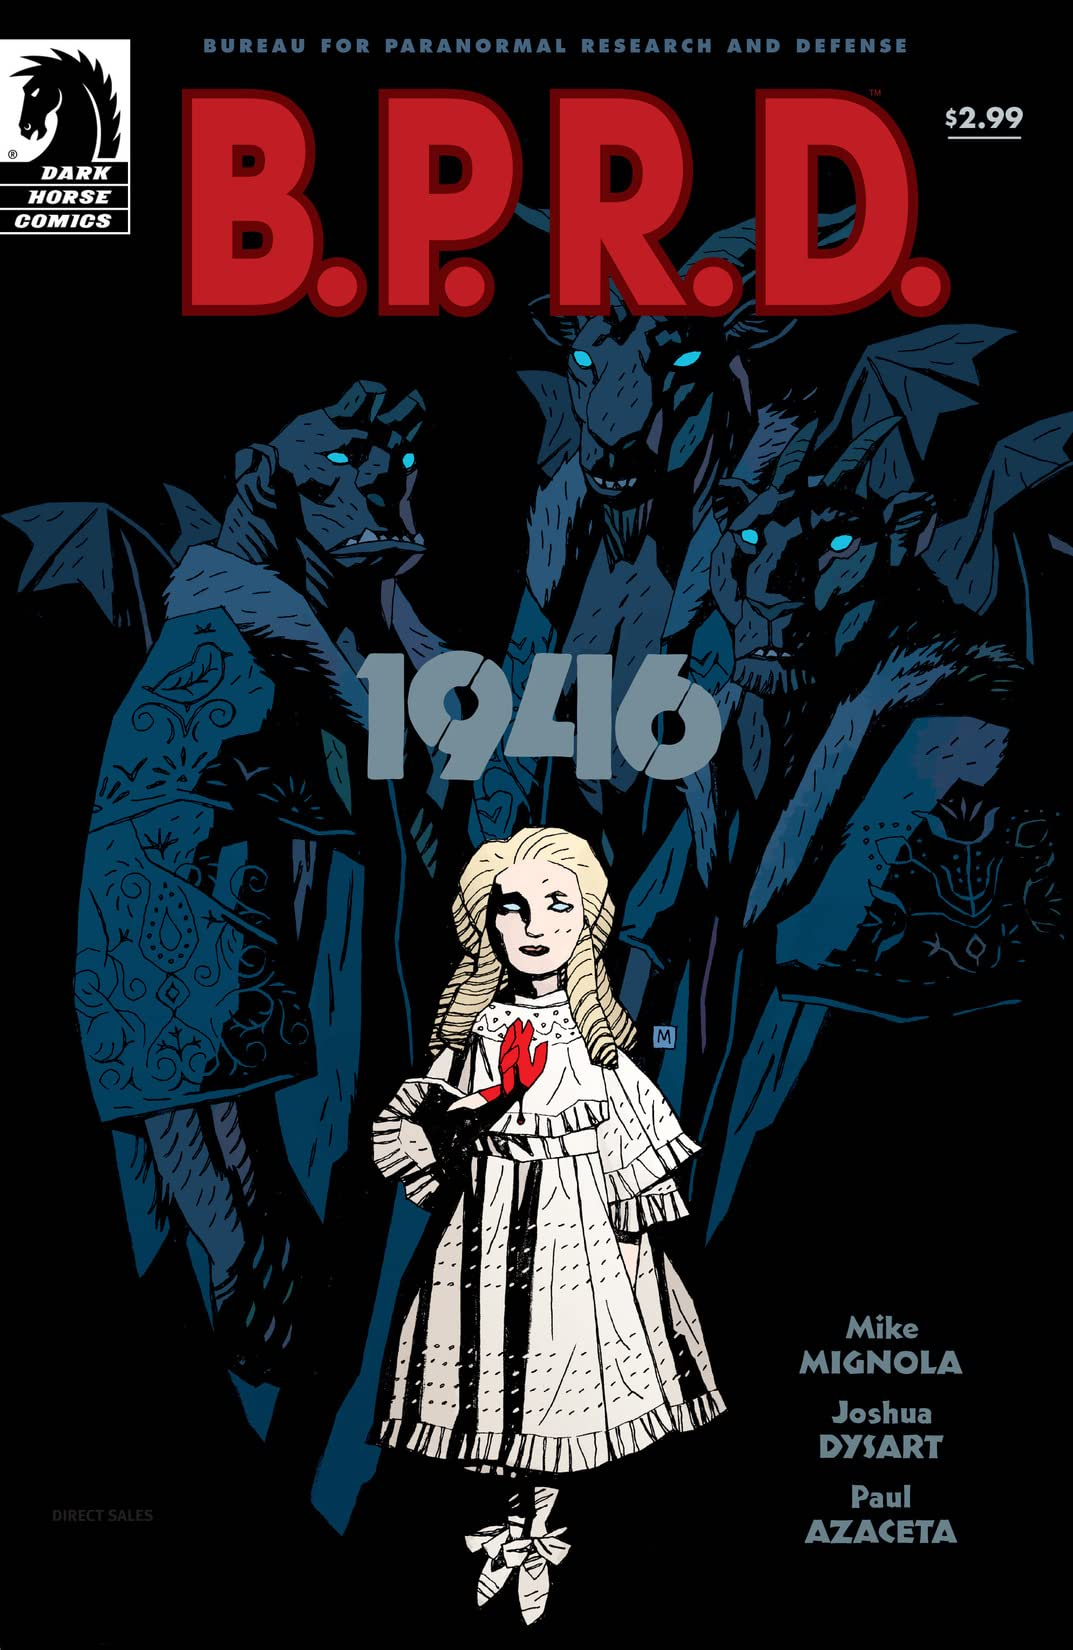 B.P.R.D.: 1946 #2